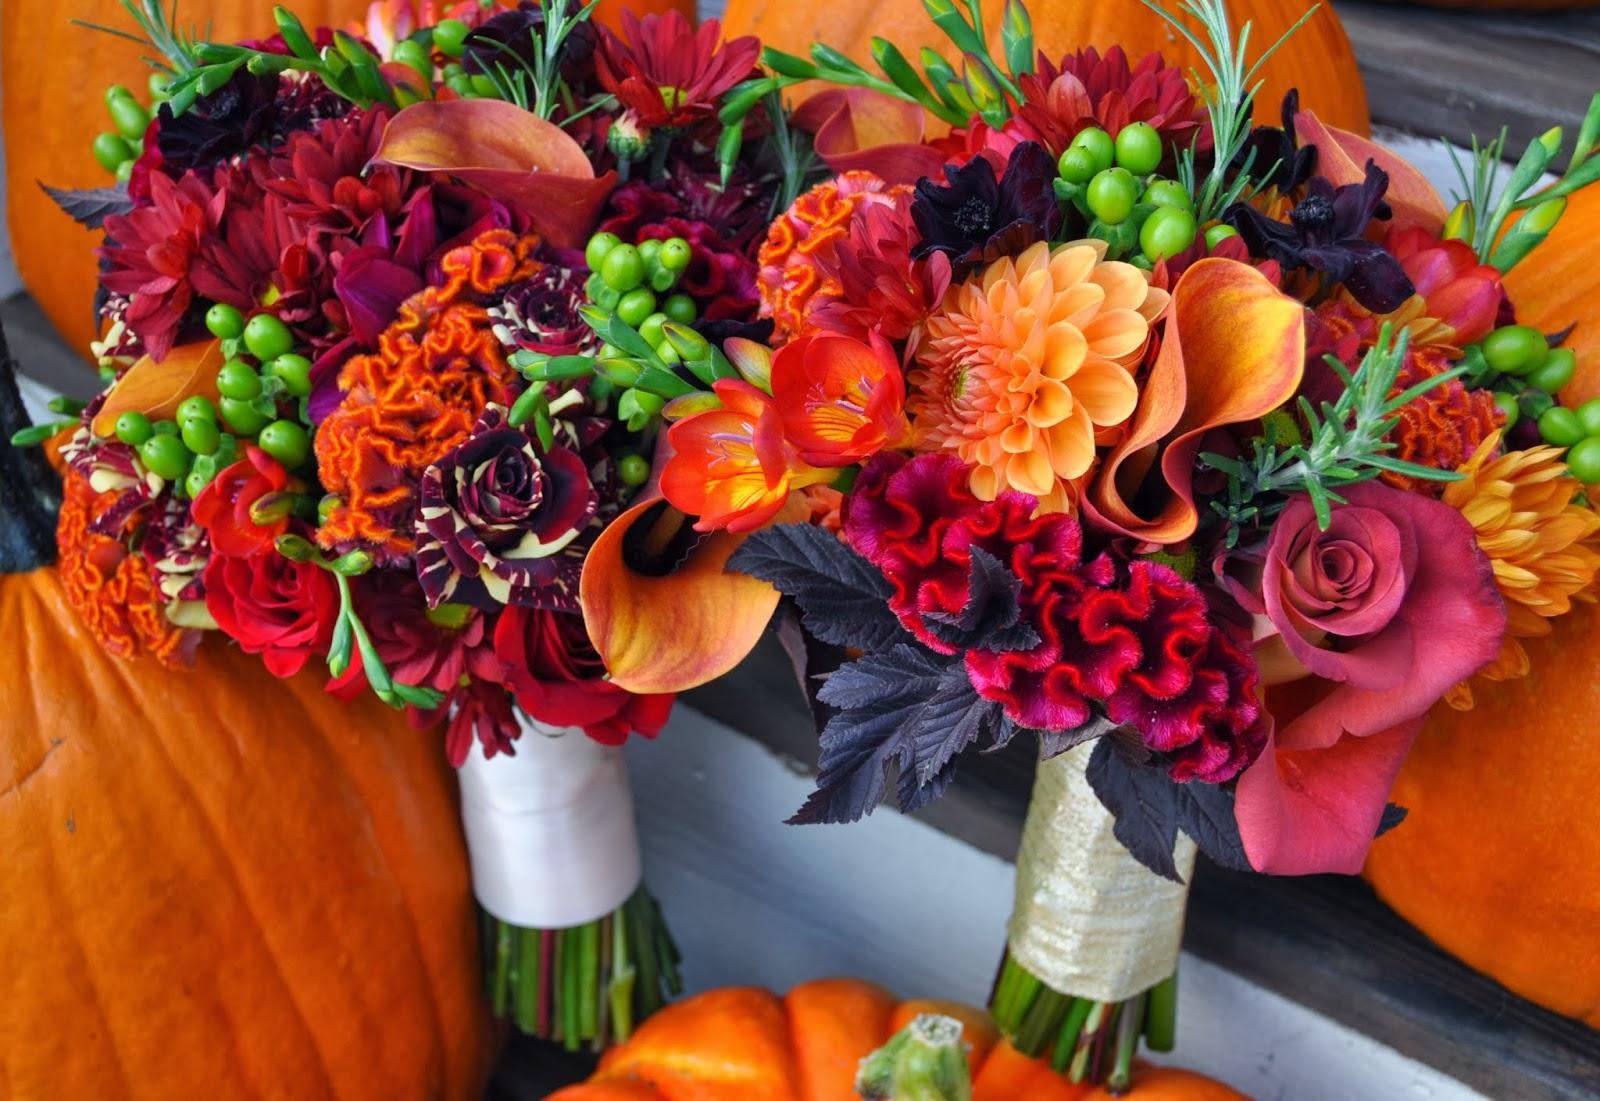 wedding themes 4 seasonal weddings fall flowers for weddings Wedding Themes 4 Seasonal Weddings